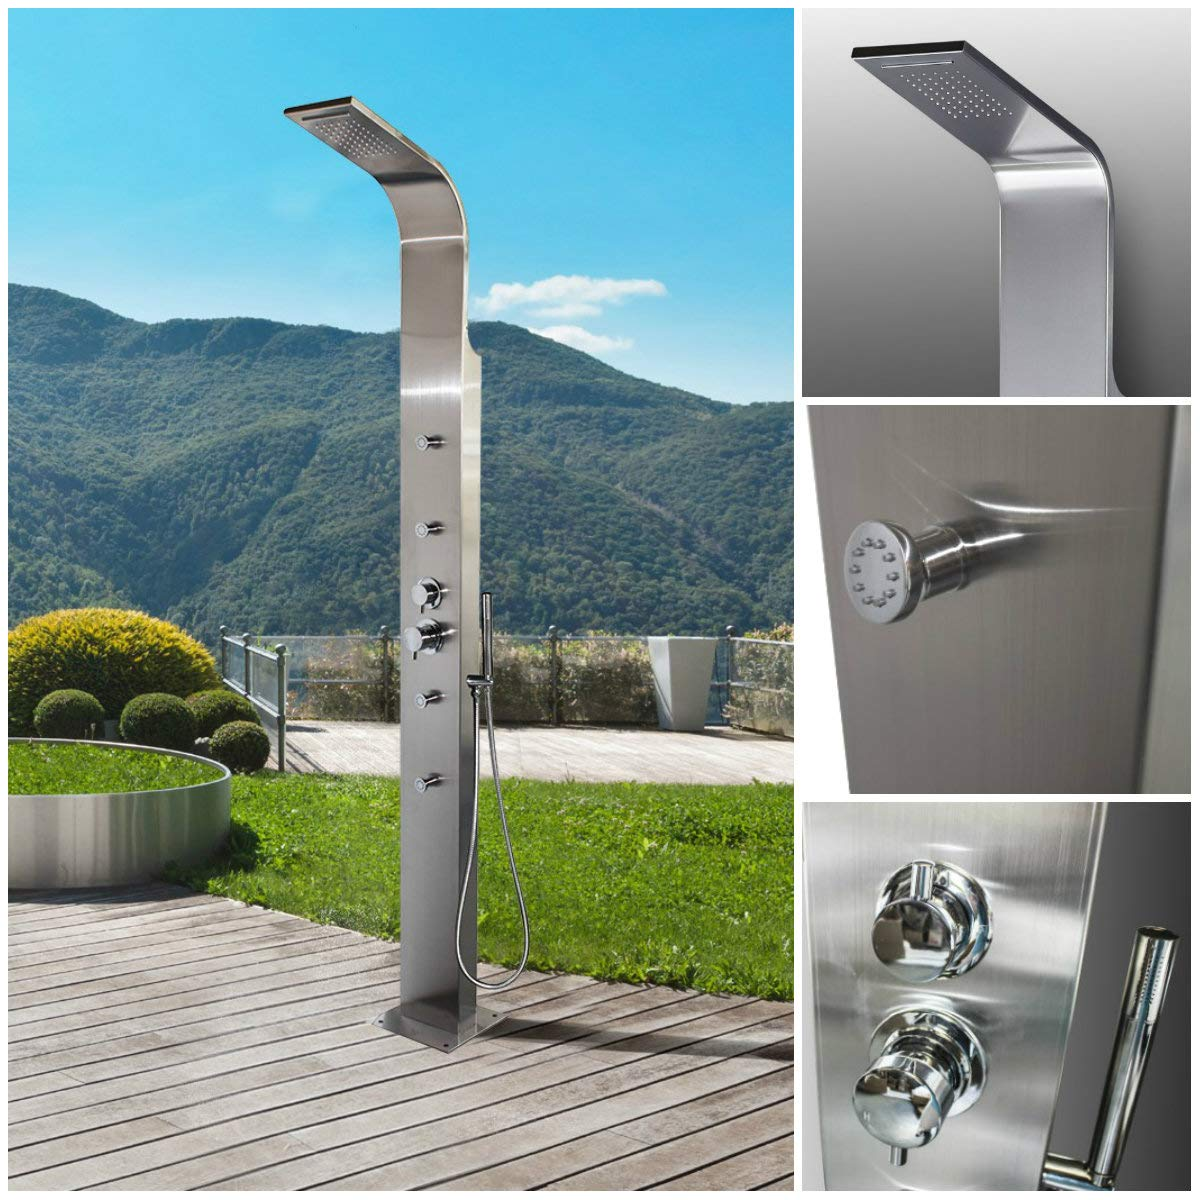 Outdoor Shower Fixtures Stainless Steel.Amazon Com 316 Marine Grade Stainless Steel Massage Outdoor